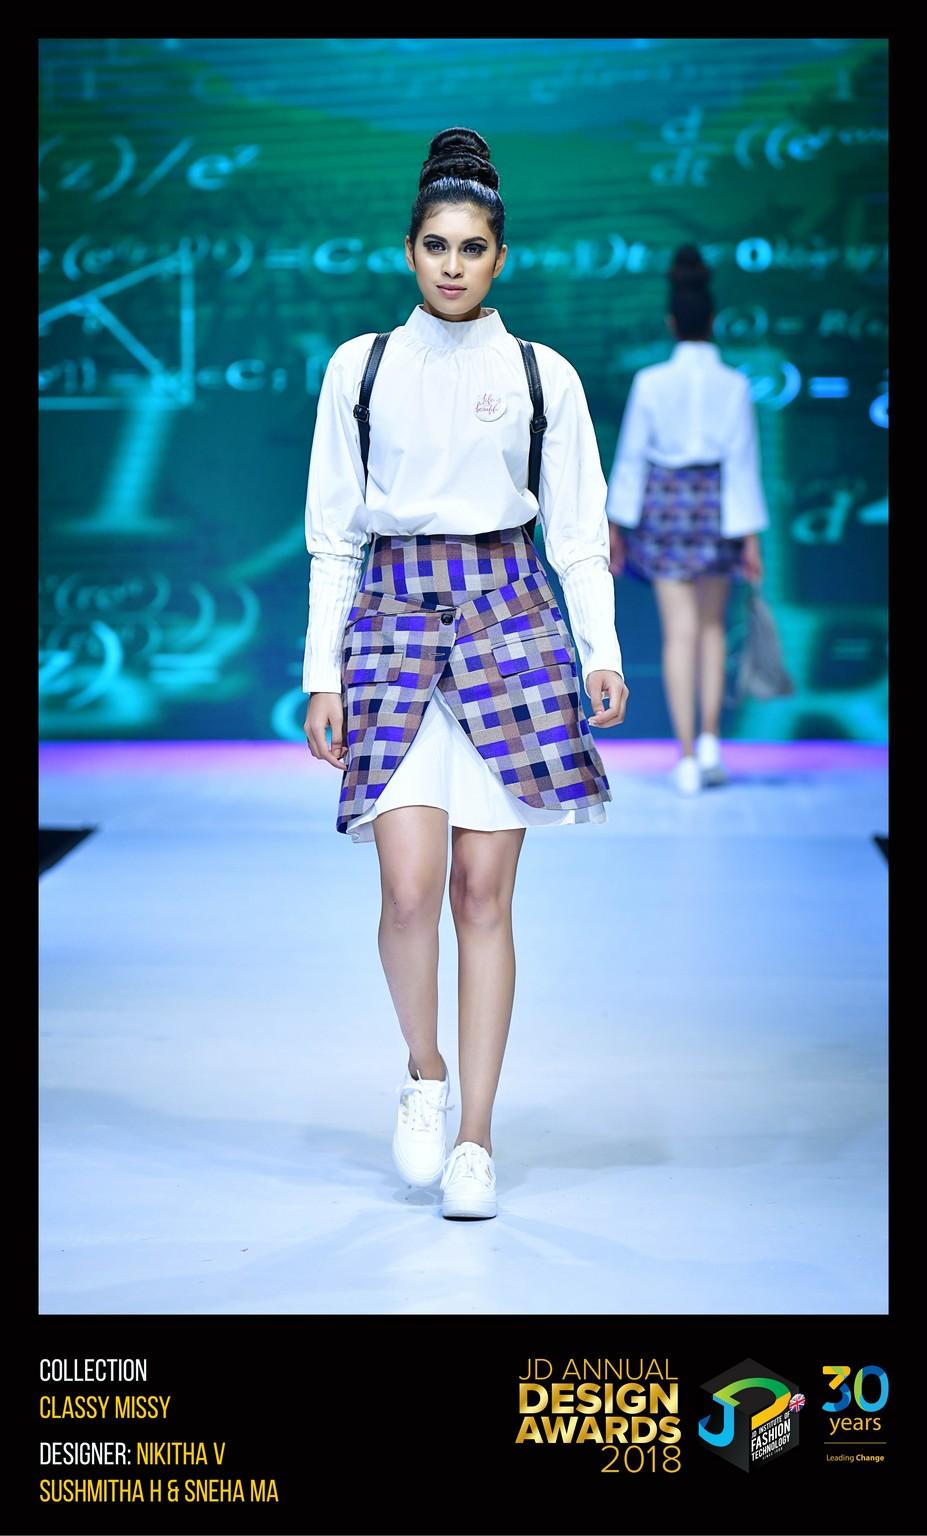 Classy Missy – Change – JD Annual Design Awards 2018 | Designer: Sneha, Nikita and Sushmita | Photography : Jerin Nath (@jerin_nath) classy missy – change – jd annual design awards 2018 - CLASSY MISSY 6 - Classy Missy – Change – JD Annual Design Awards 2018